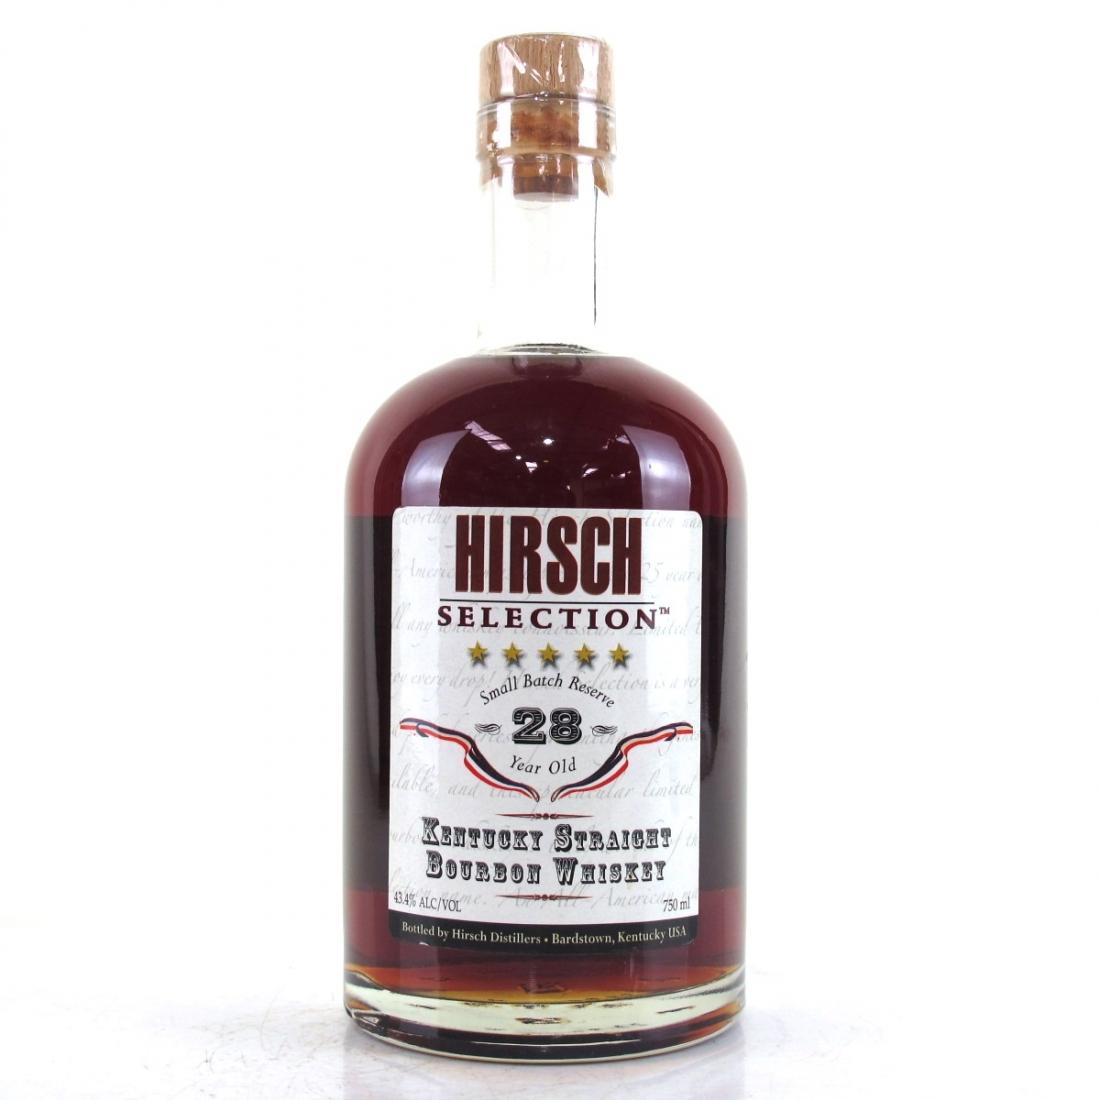 Hirsch Selection Kentucky Straight Bourbon 28 Year Old